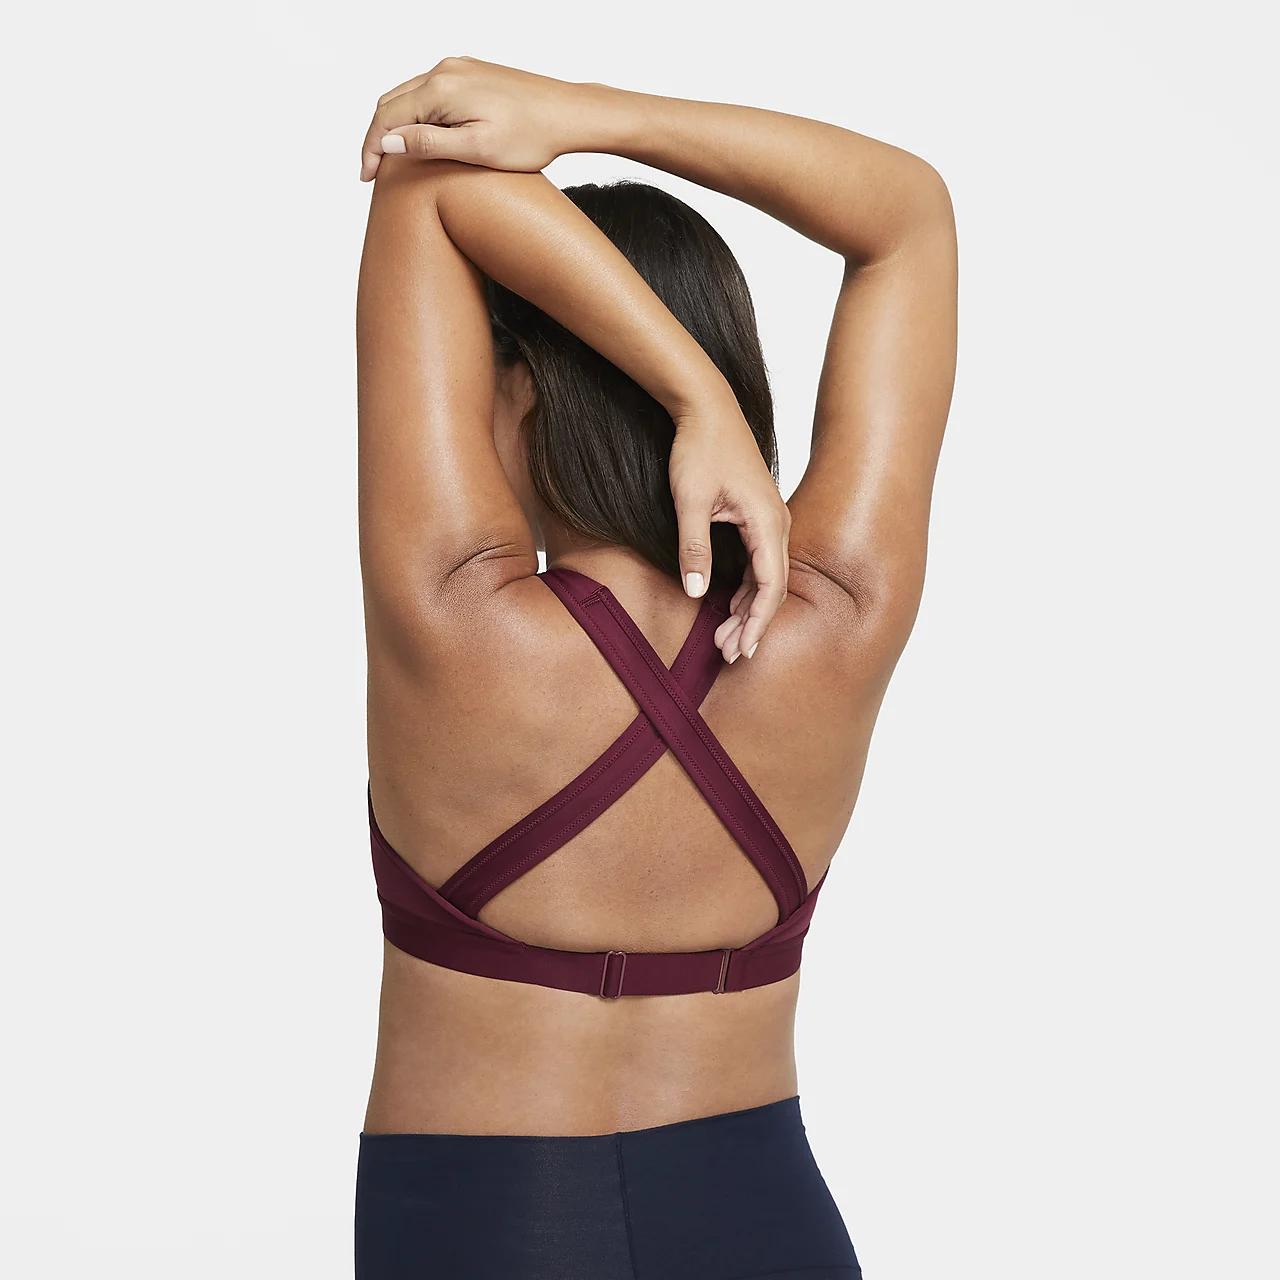 Nike (M) Swoosh Women's Medium-Support Sports Bra (Maternity) CQ9289-638